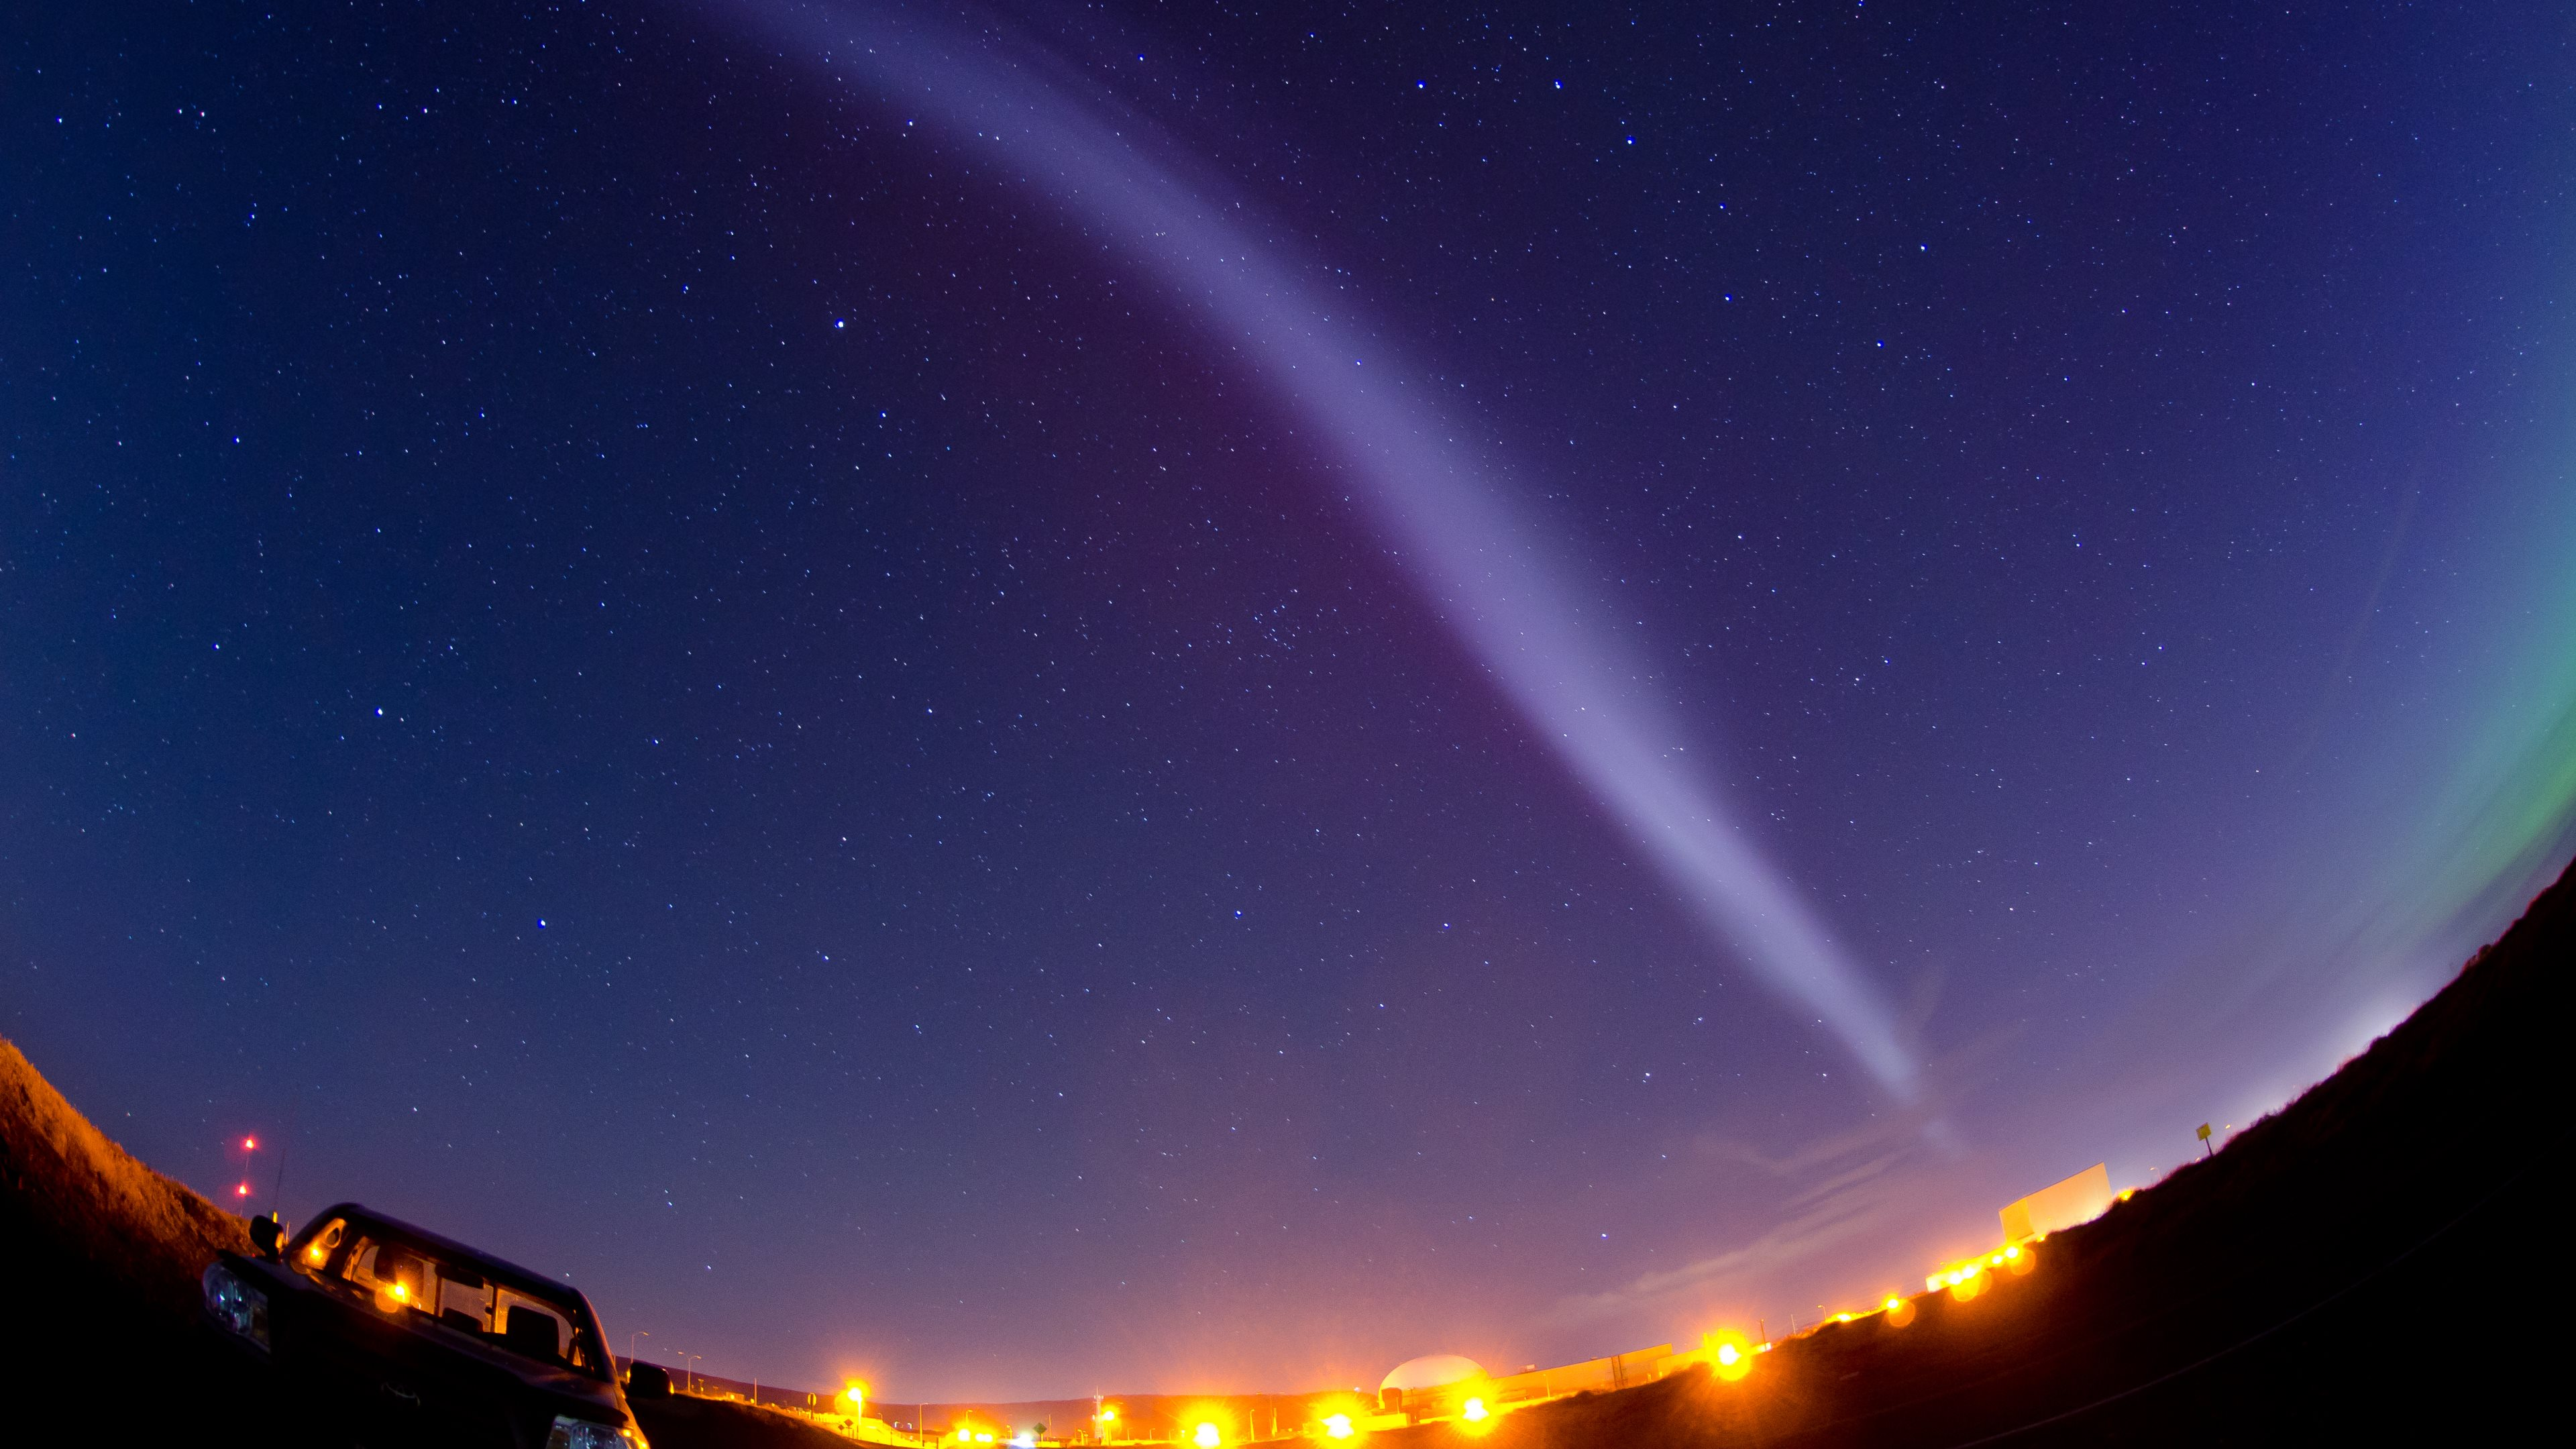 northern lights wallpaper 4k - photo #16